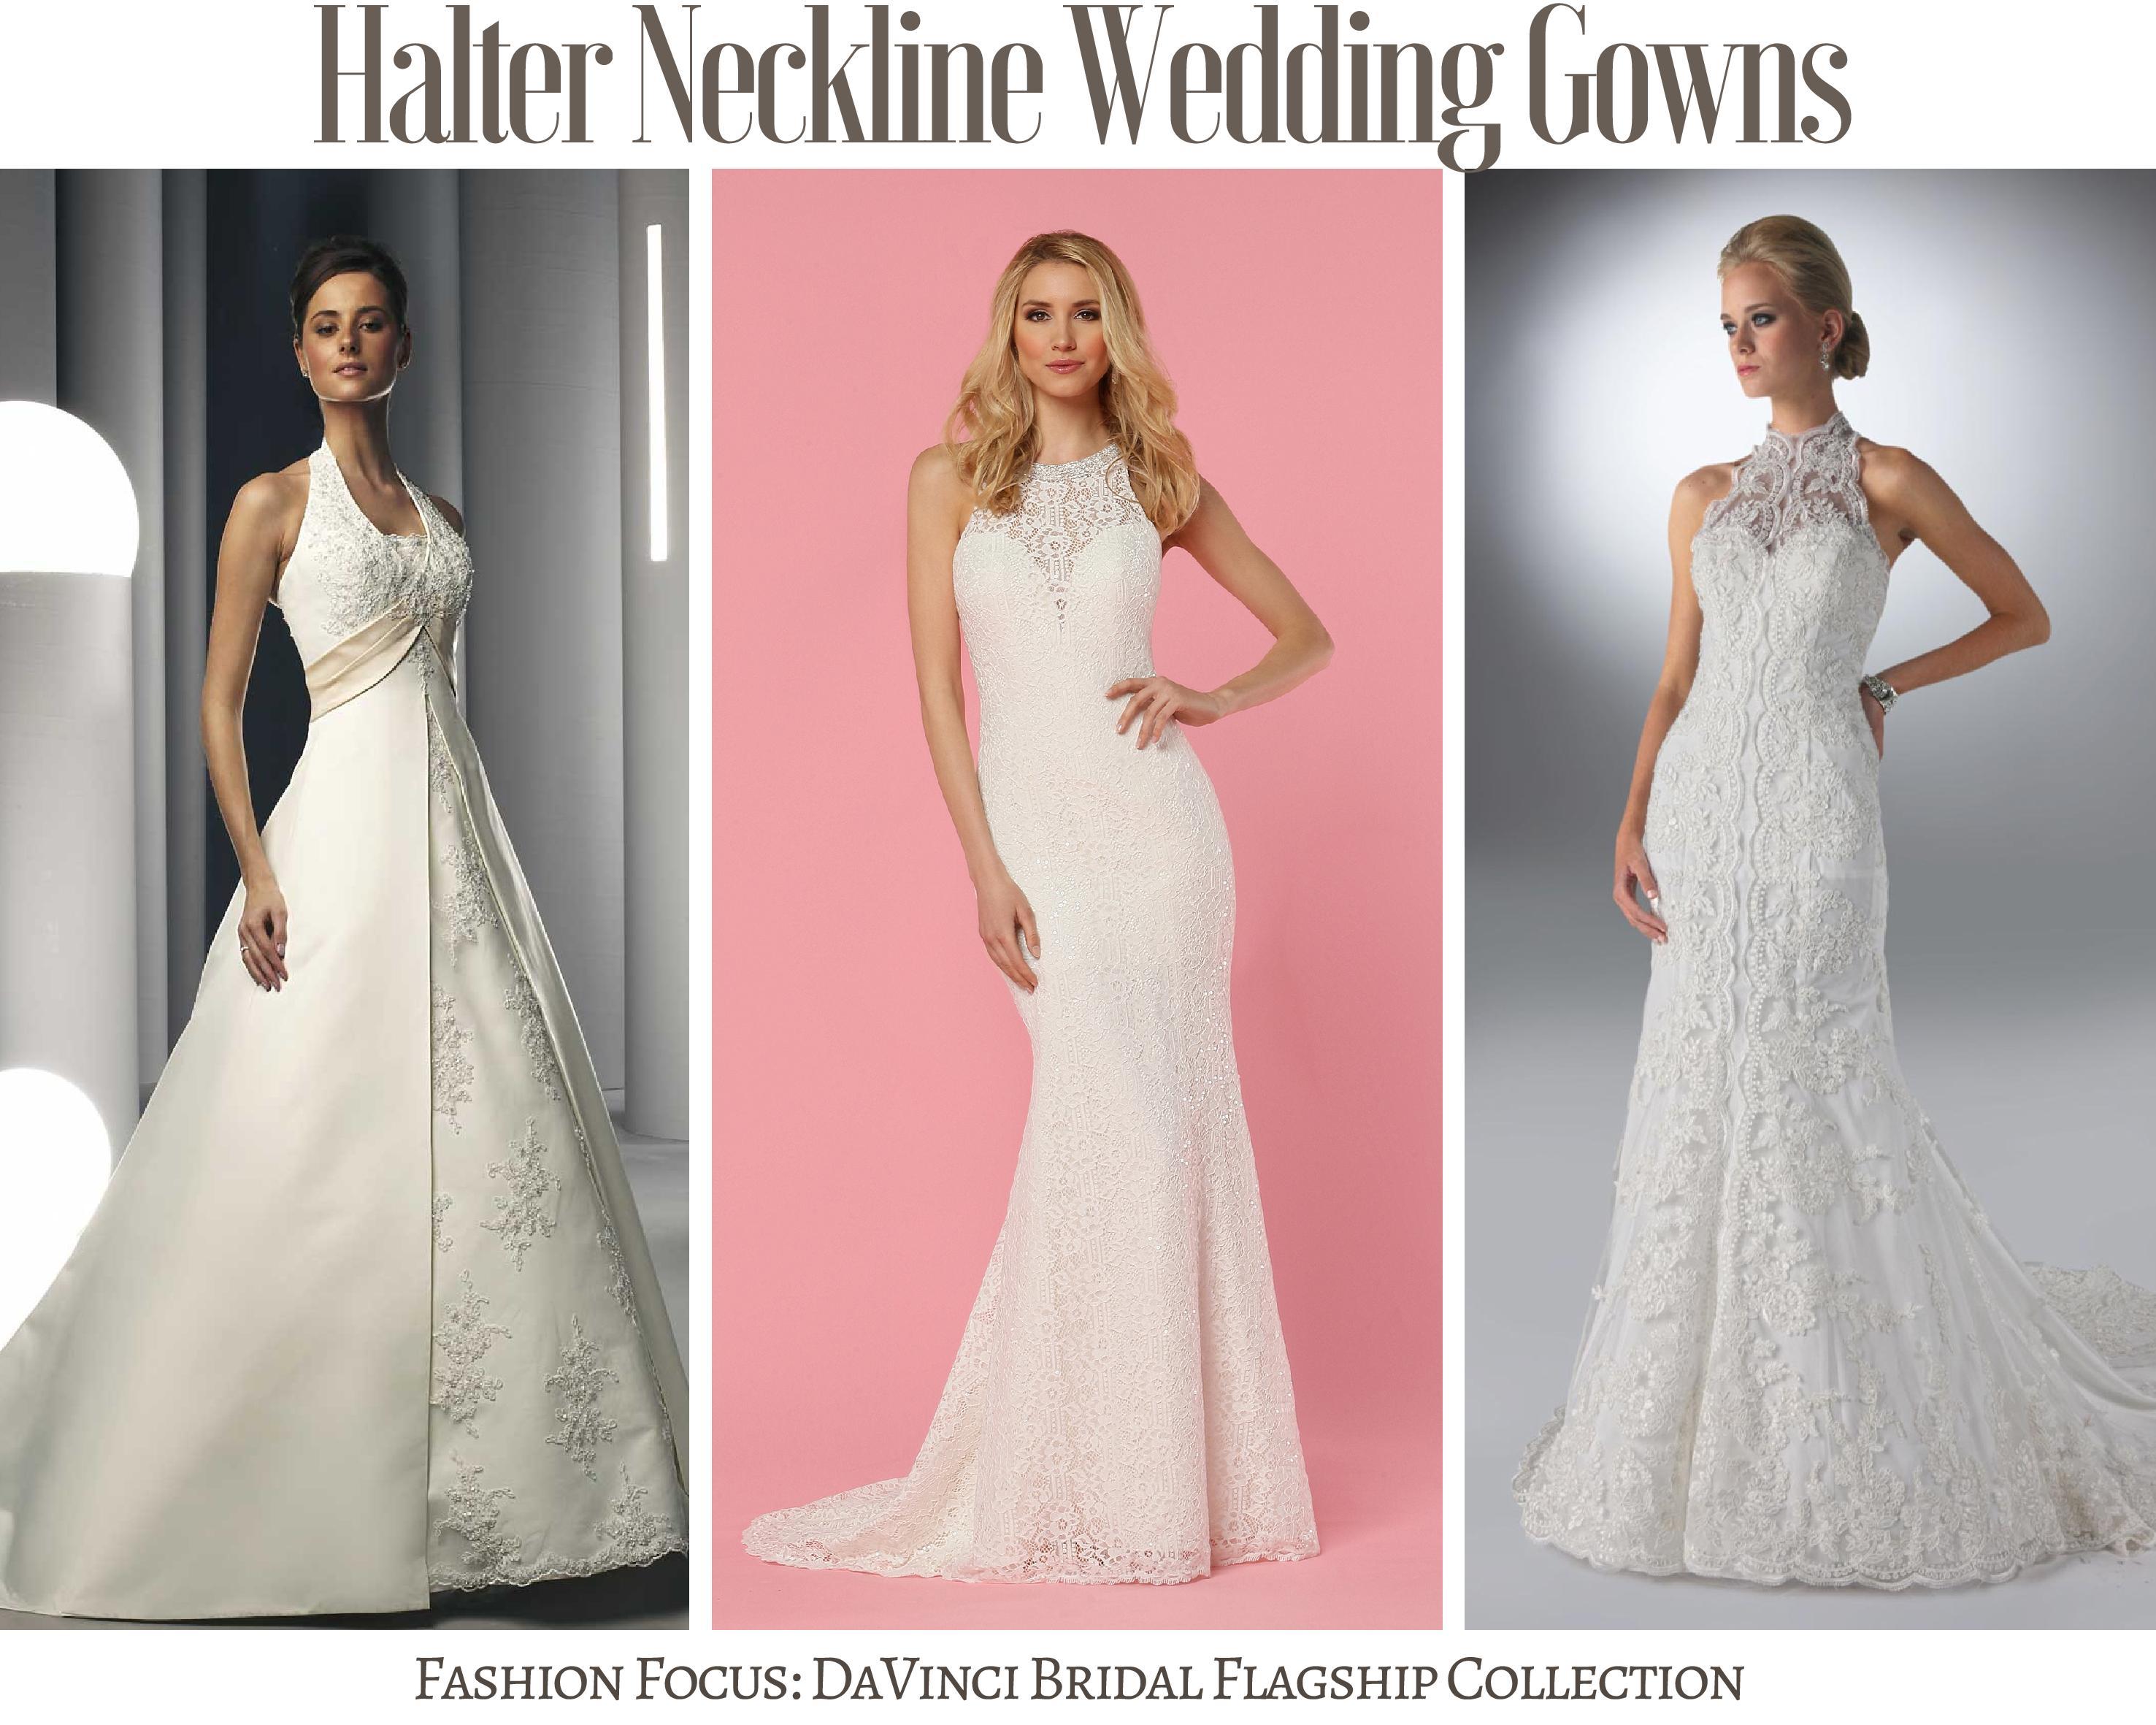 Glamour wedding dress sweepstakes today